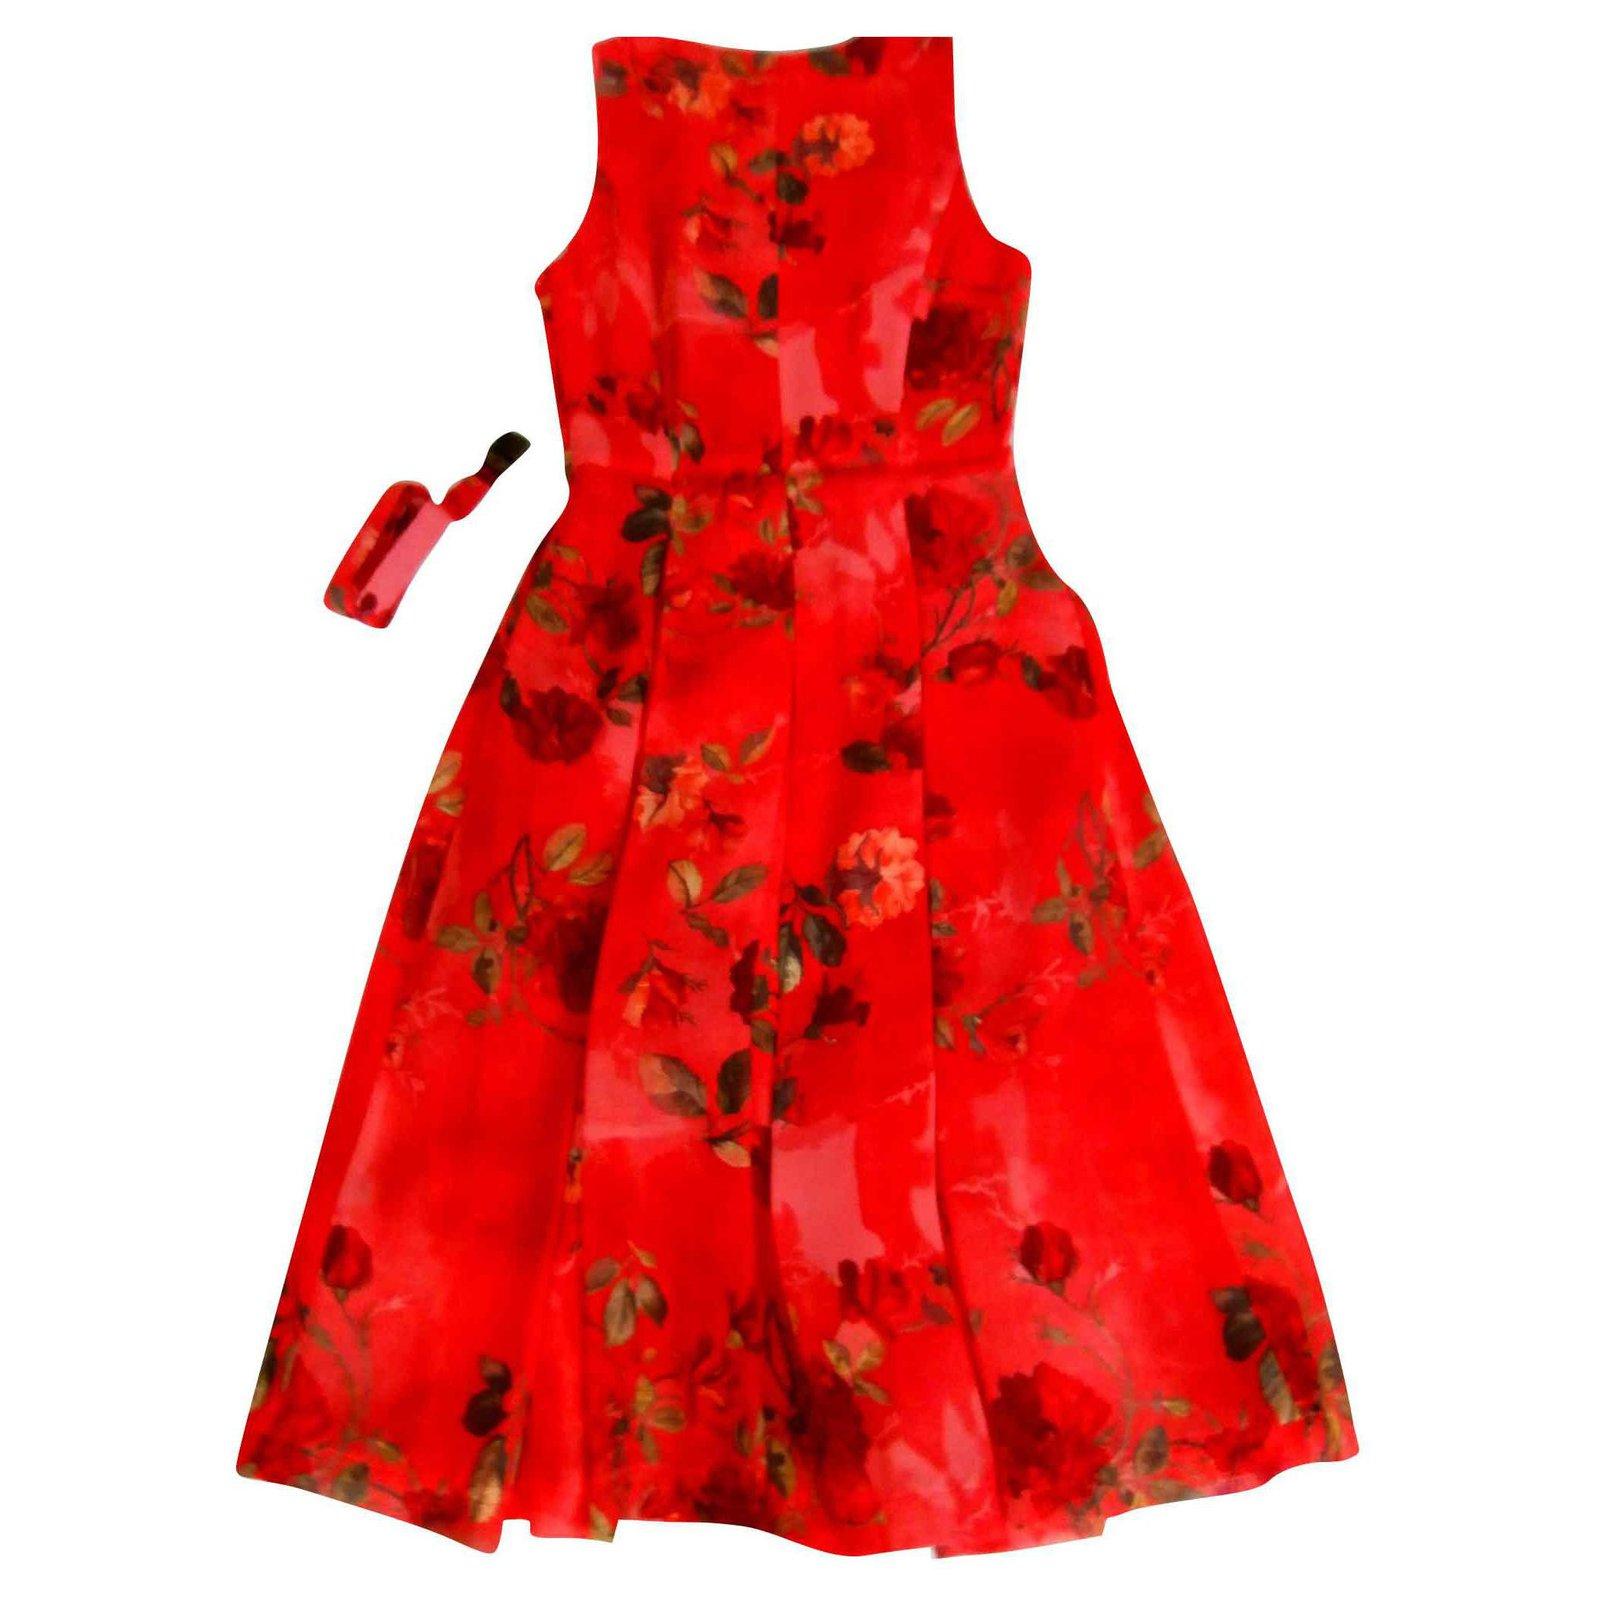 Zapa Kleid Rot Mit Blumenmuster Viskose Ref 139749 Joli Closet